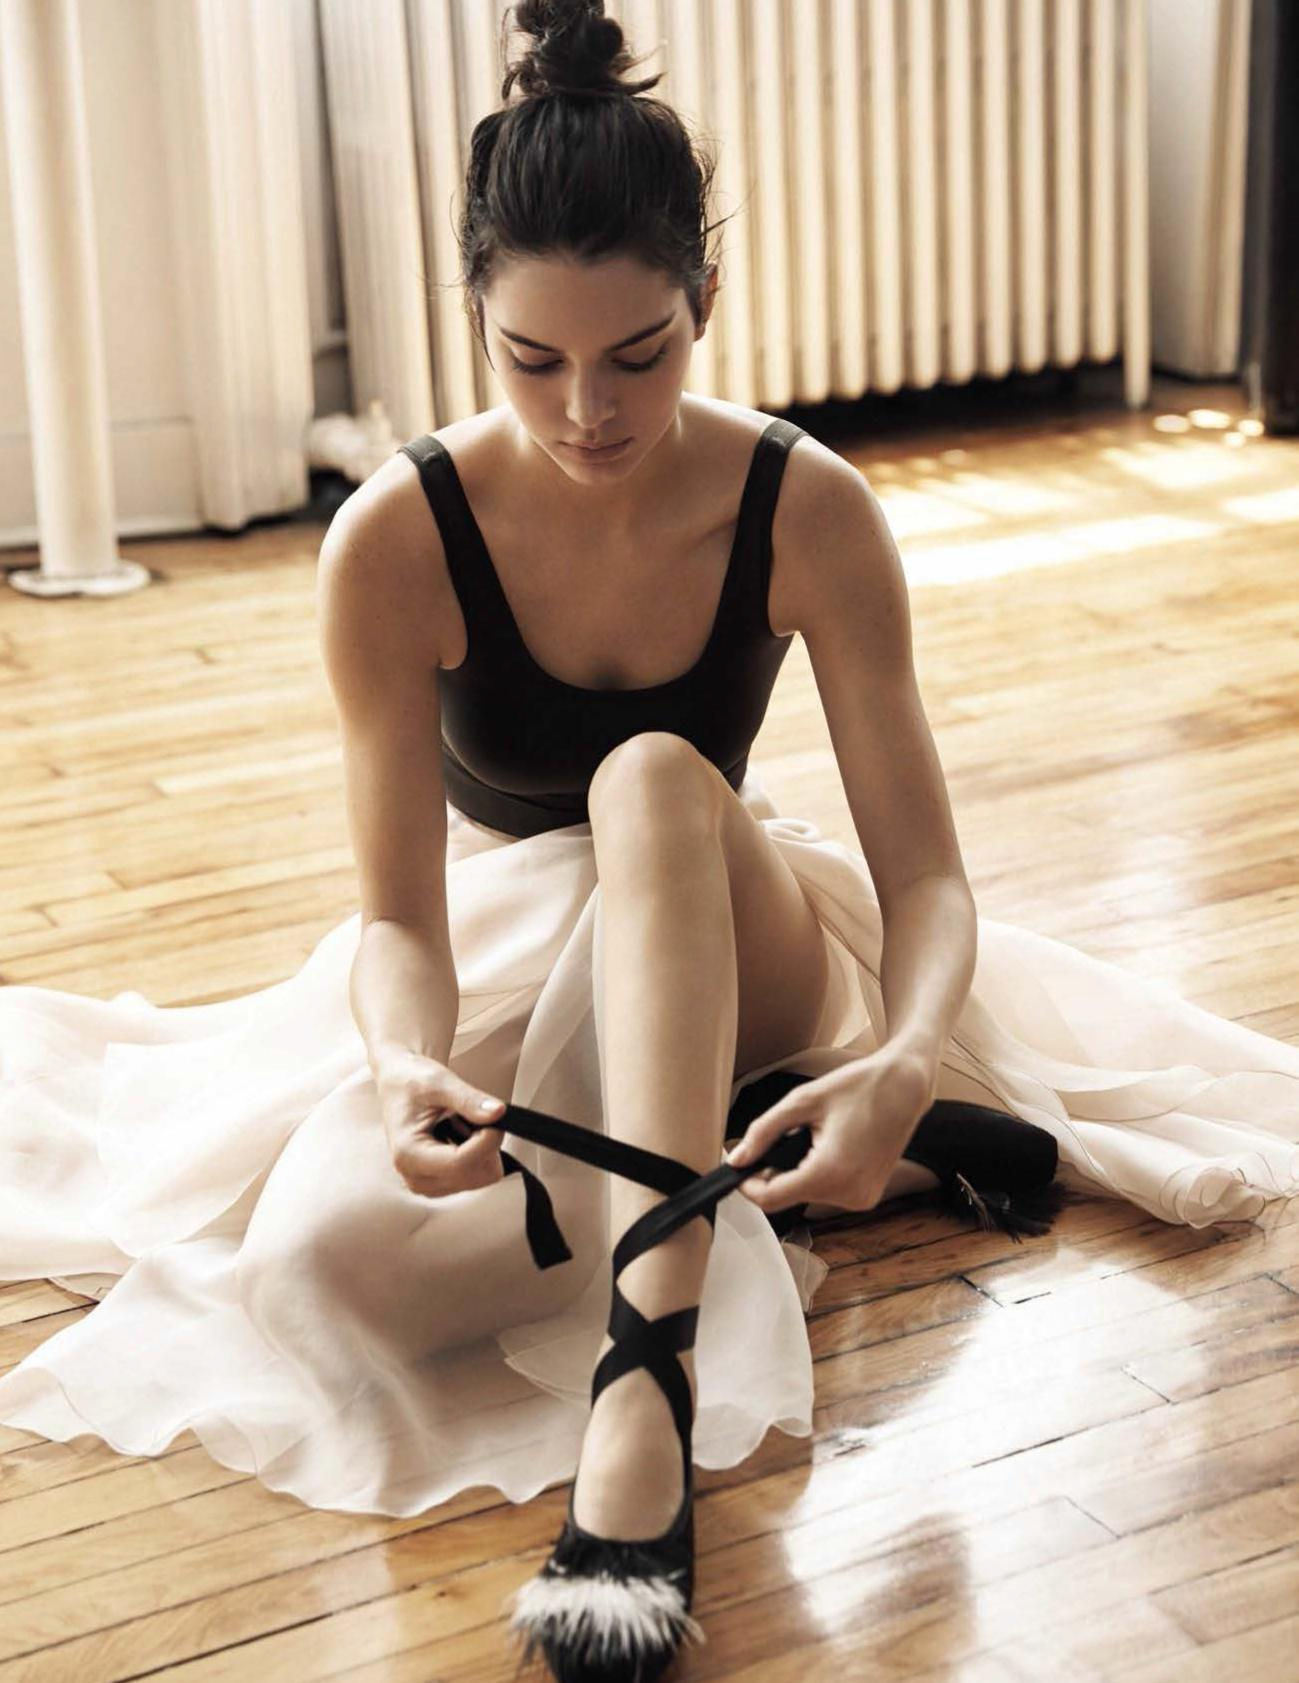 боди, Theory; юбка из огранзы, Carolina Herrera N.Y.; пуанты, Opéra National de Paris